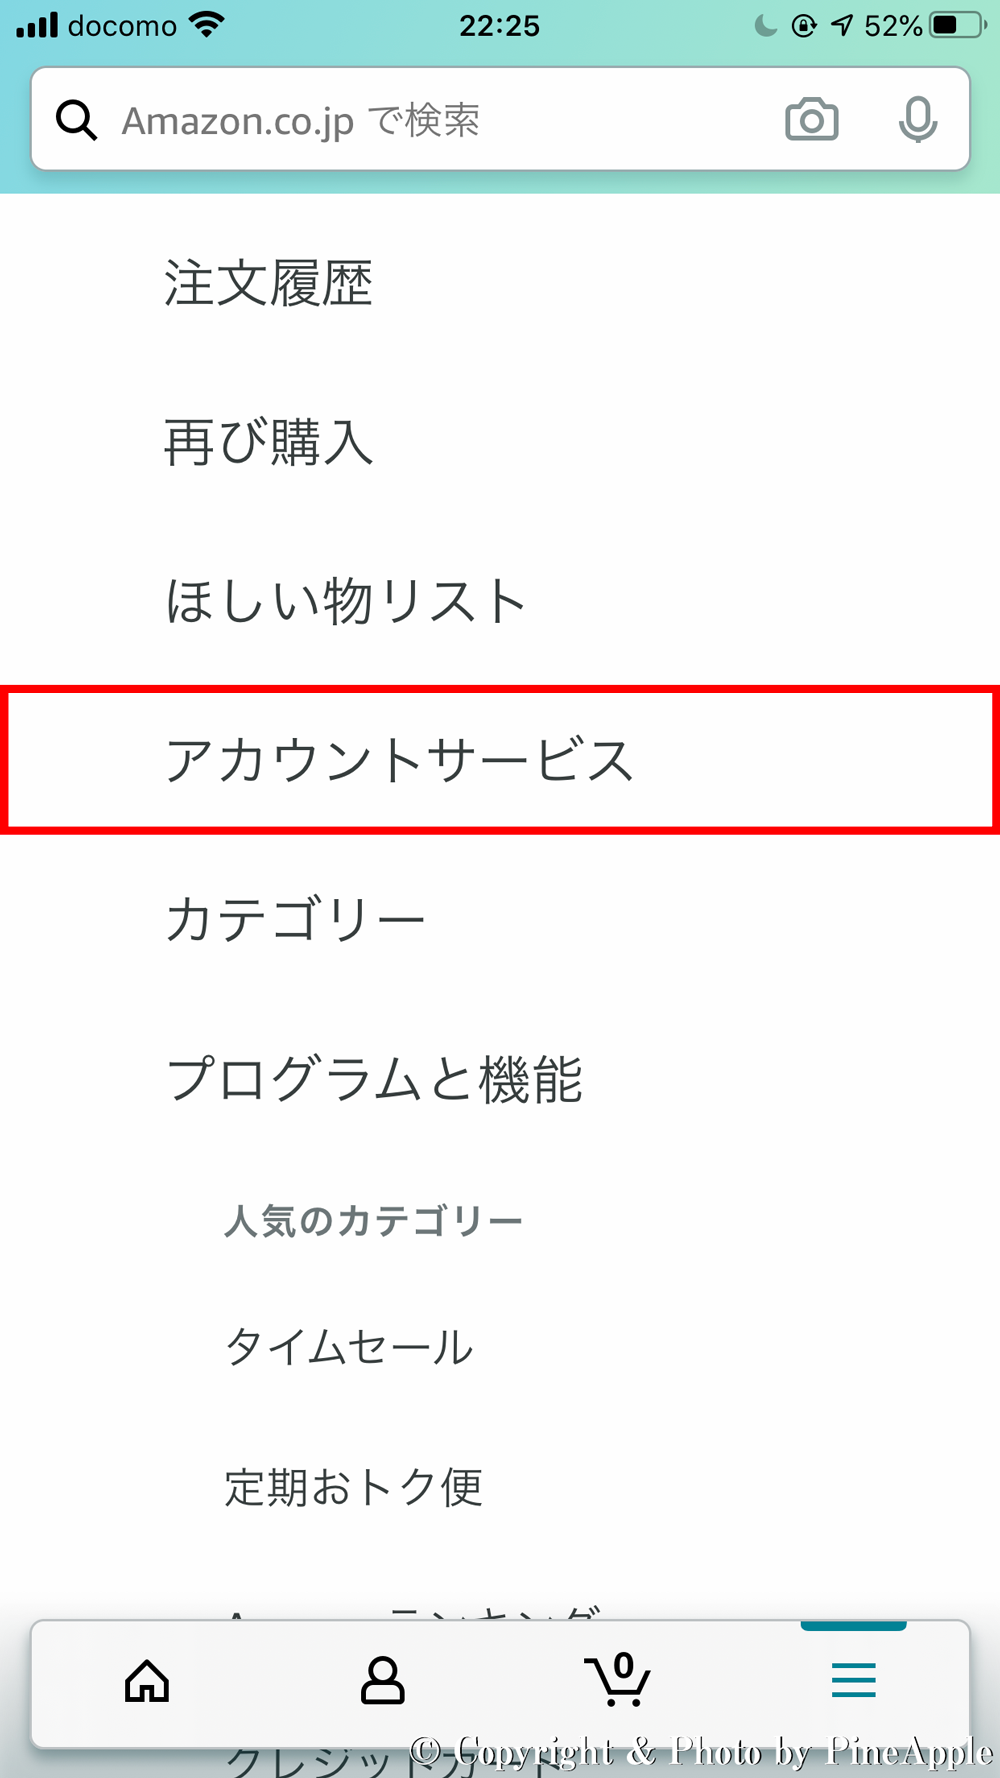 Amazon アカウントの「公開名」を編集する方法:「アカウントサービス」をタップ